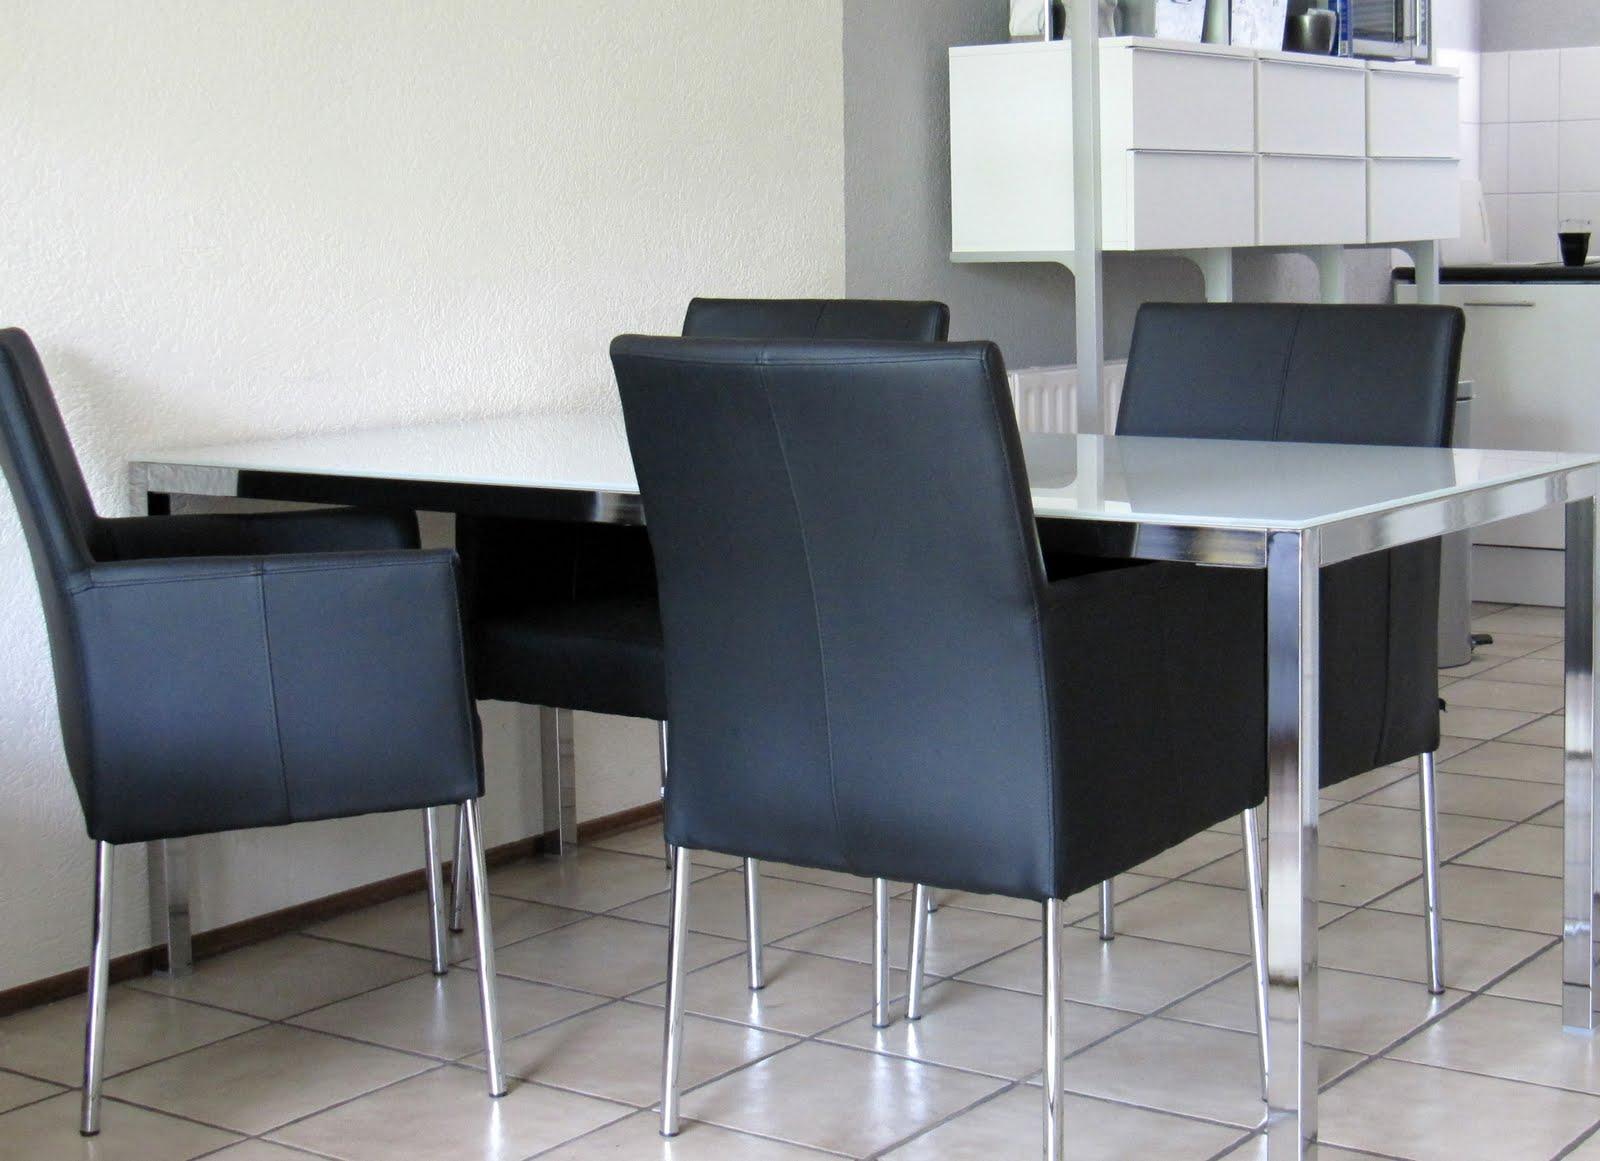 Ikea eettafel ingo ikea vierkante tafel